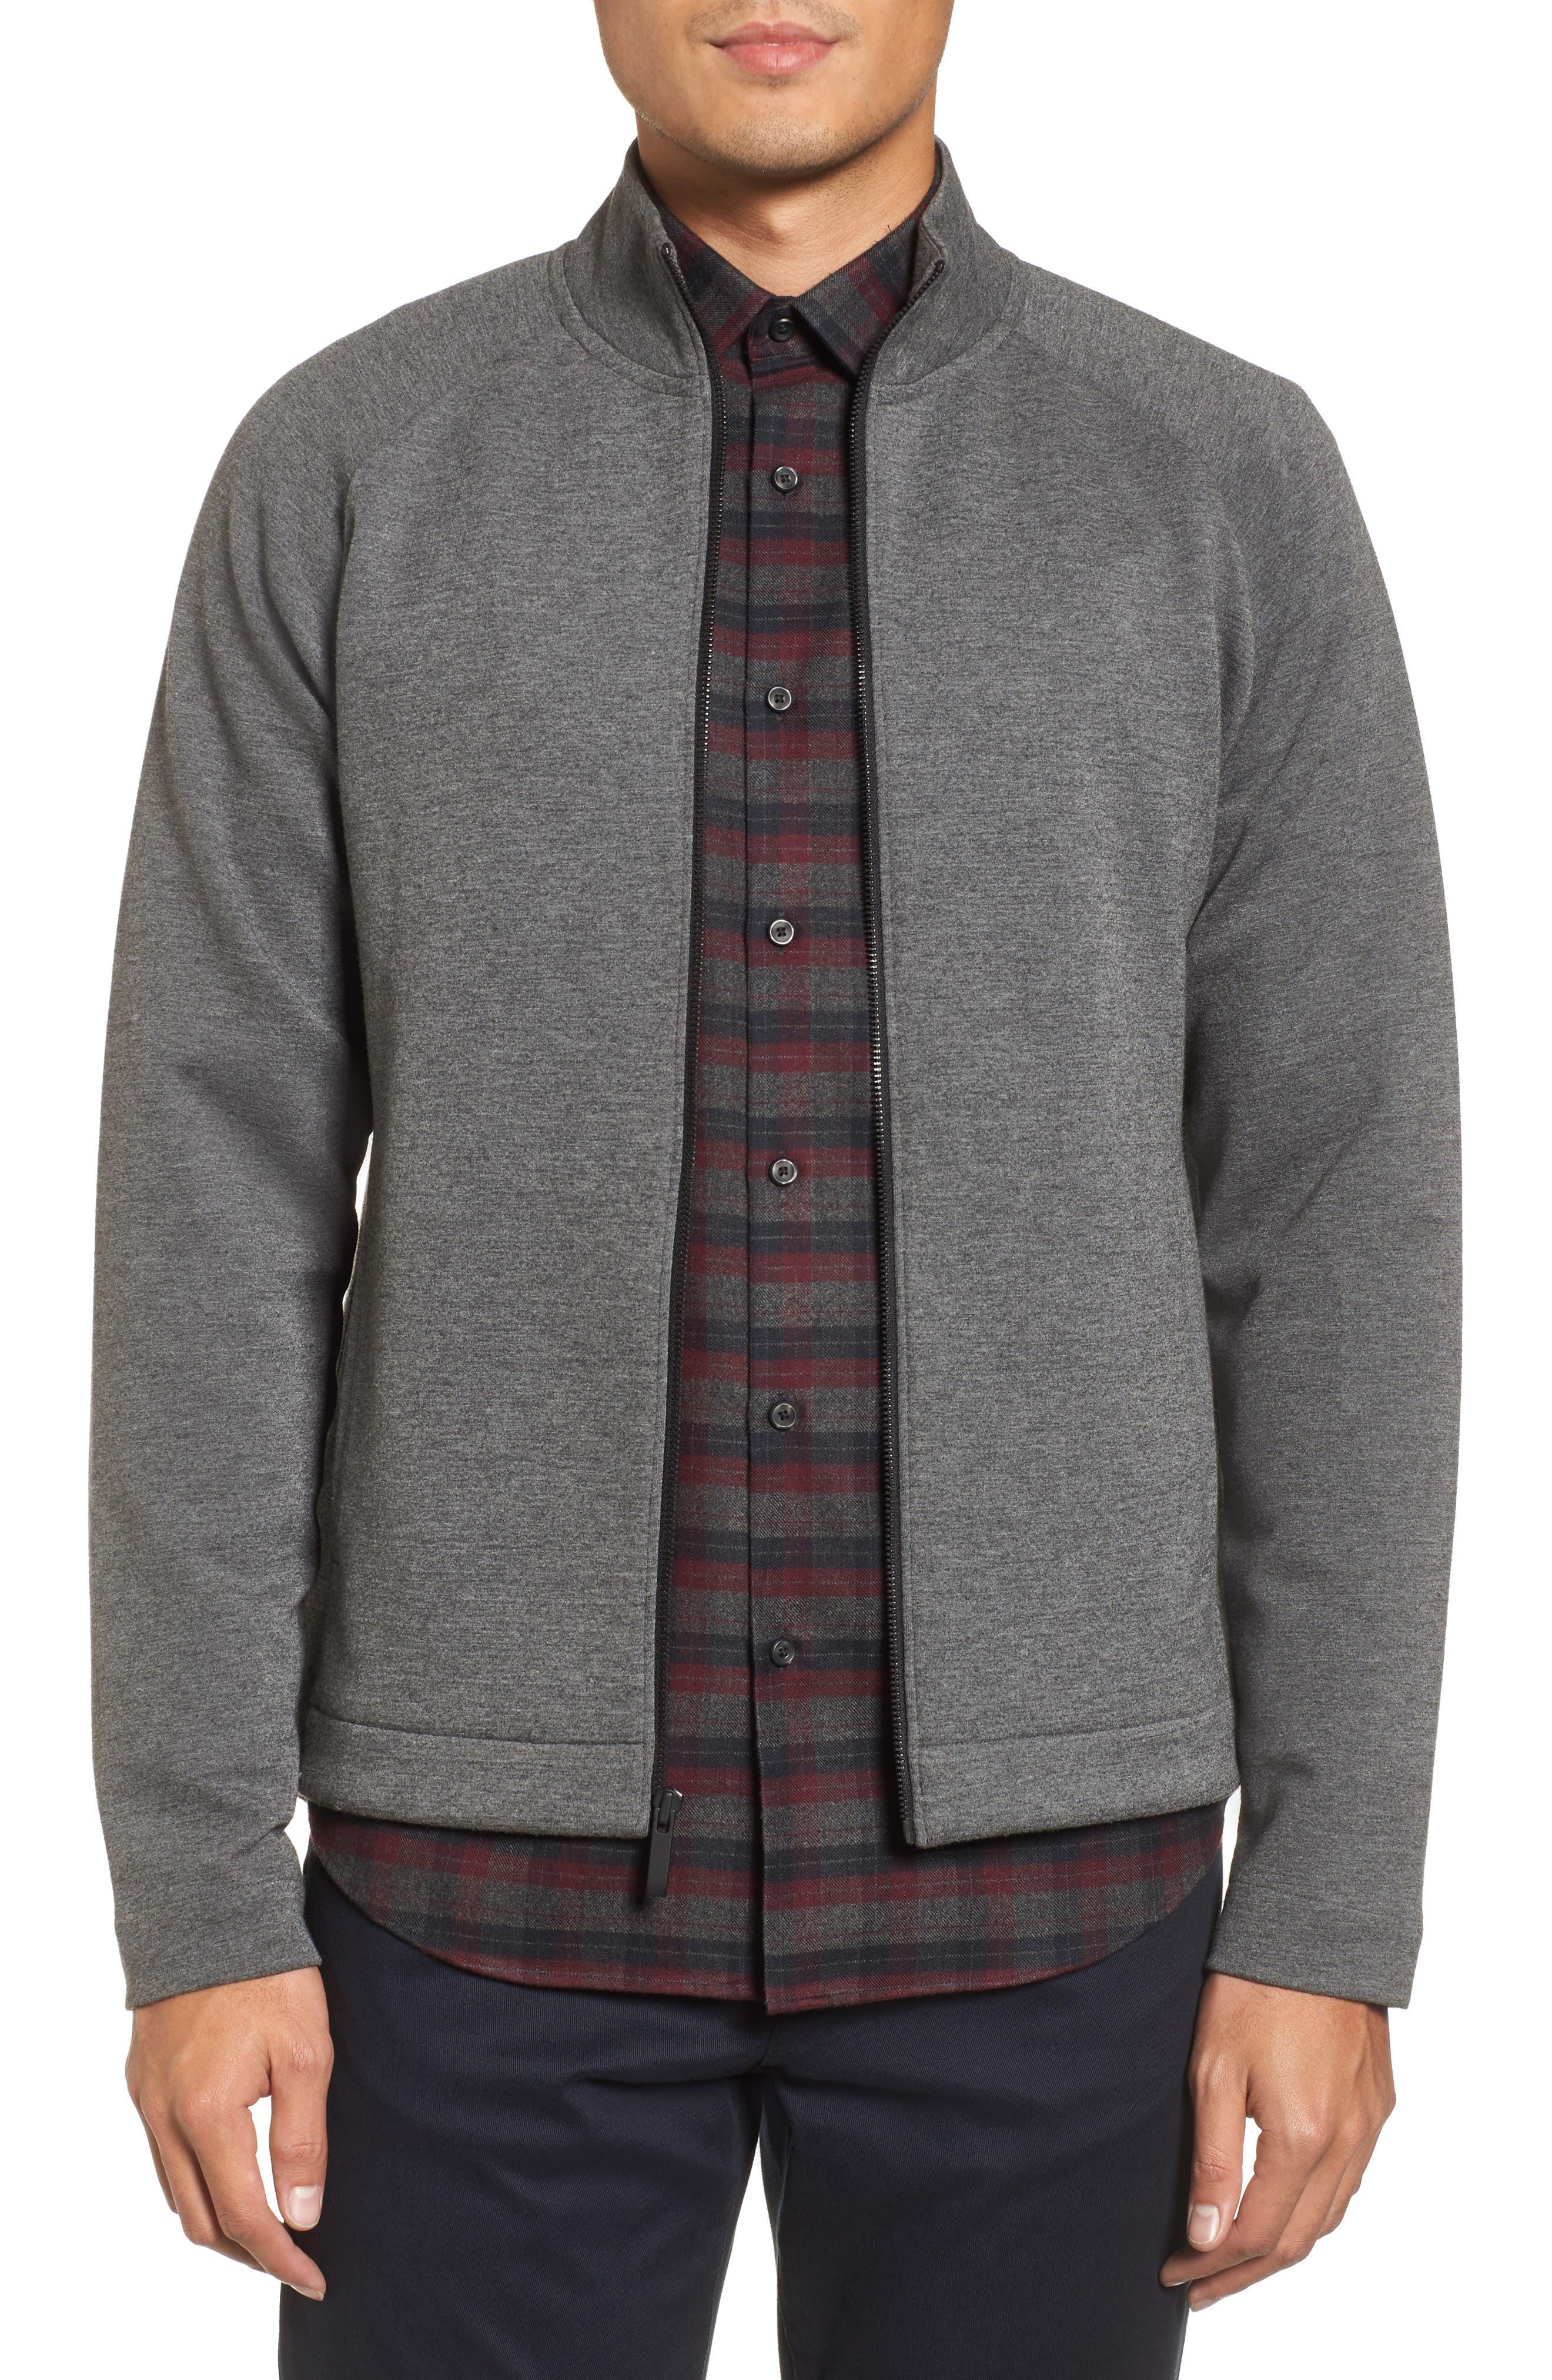 Fleece Jacket,                             Main thumbnail 1, color,                             Grey Magnet Heather